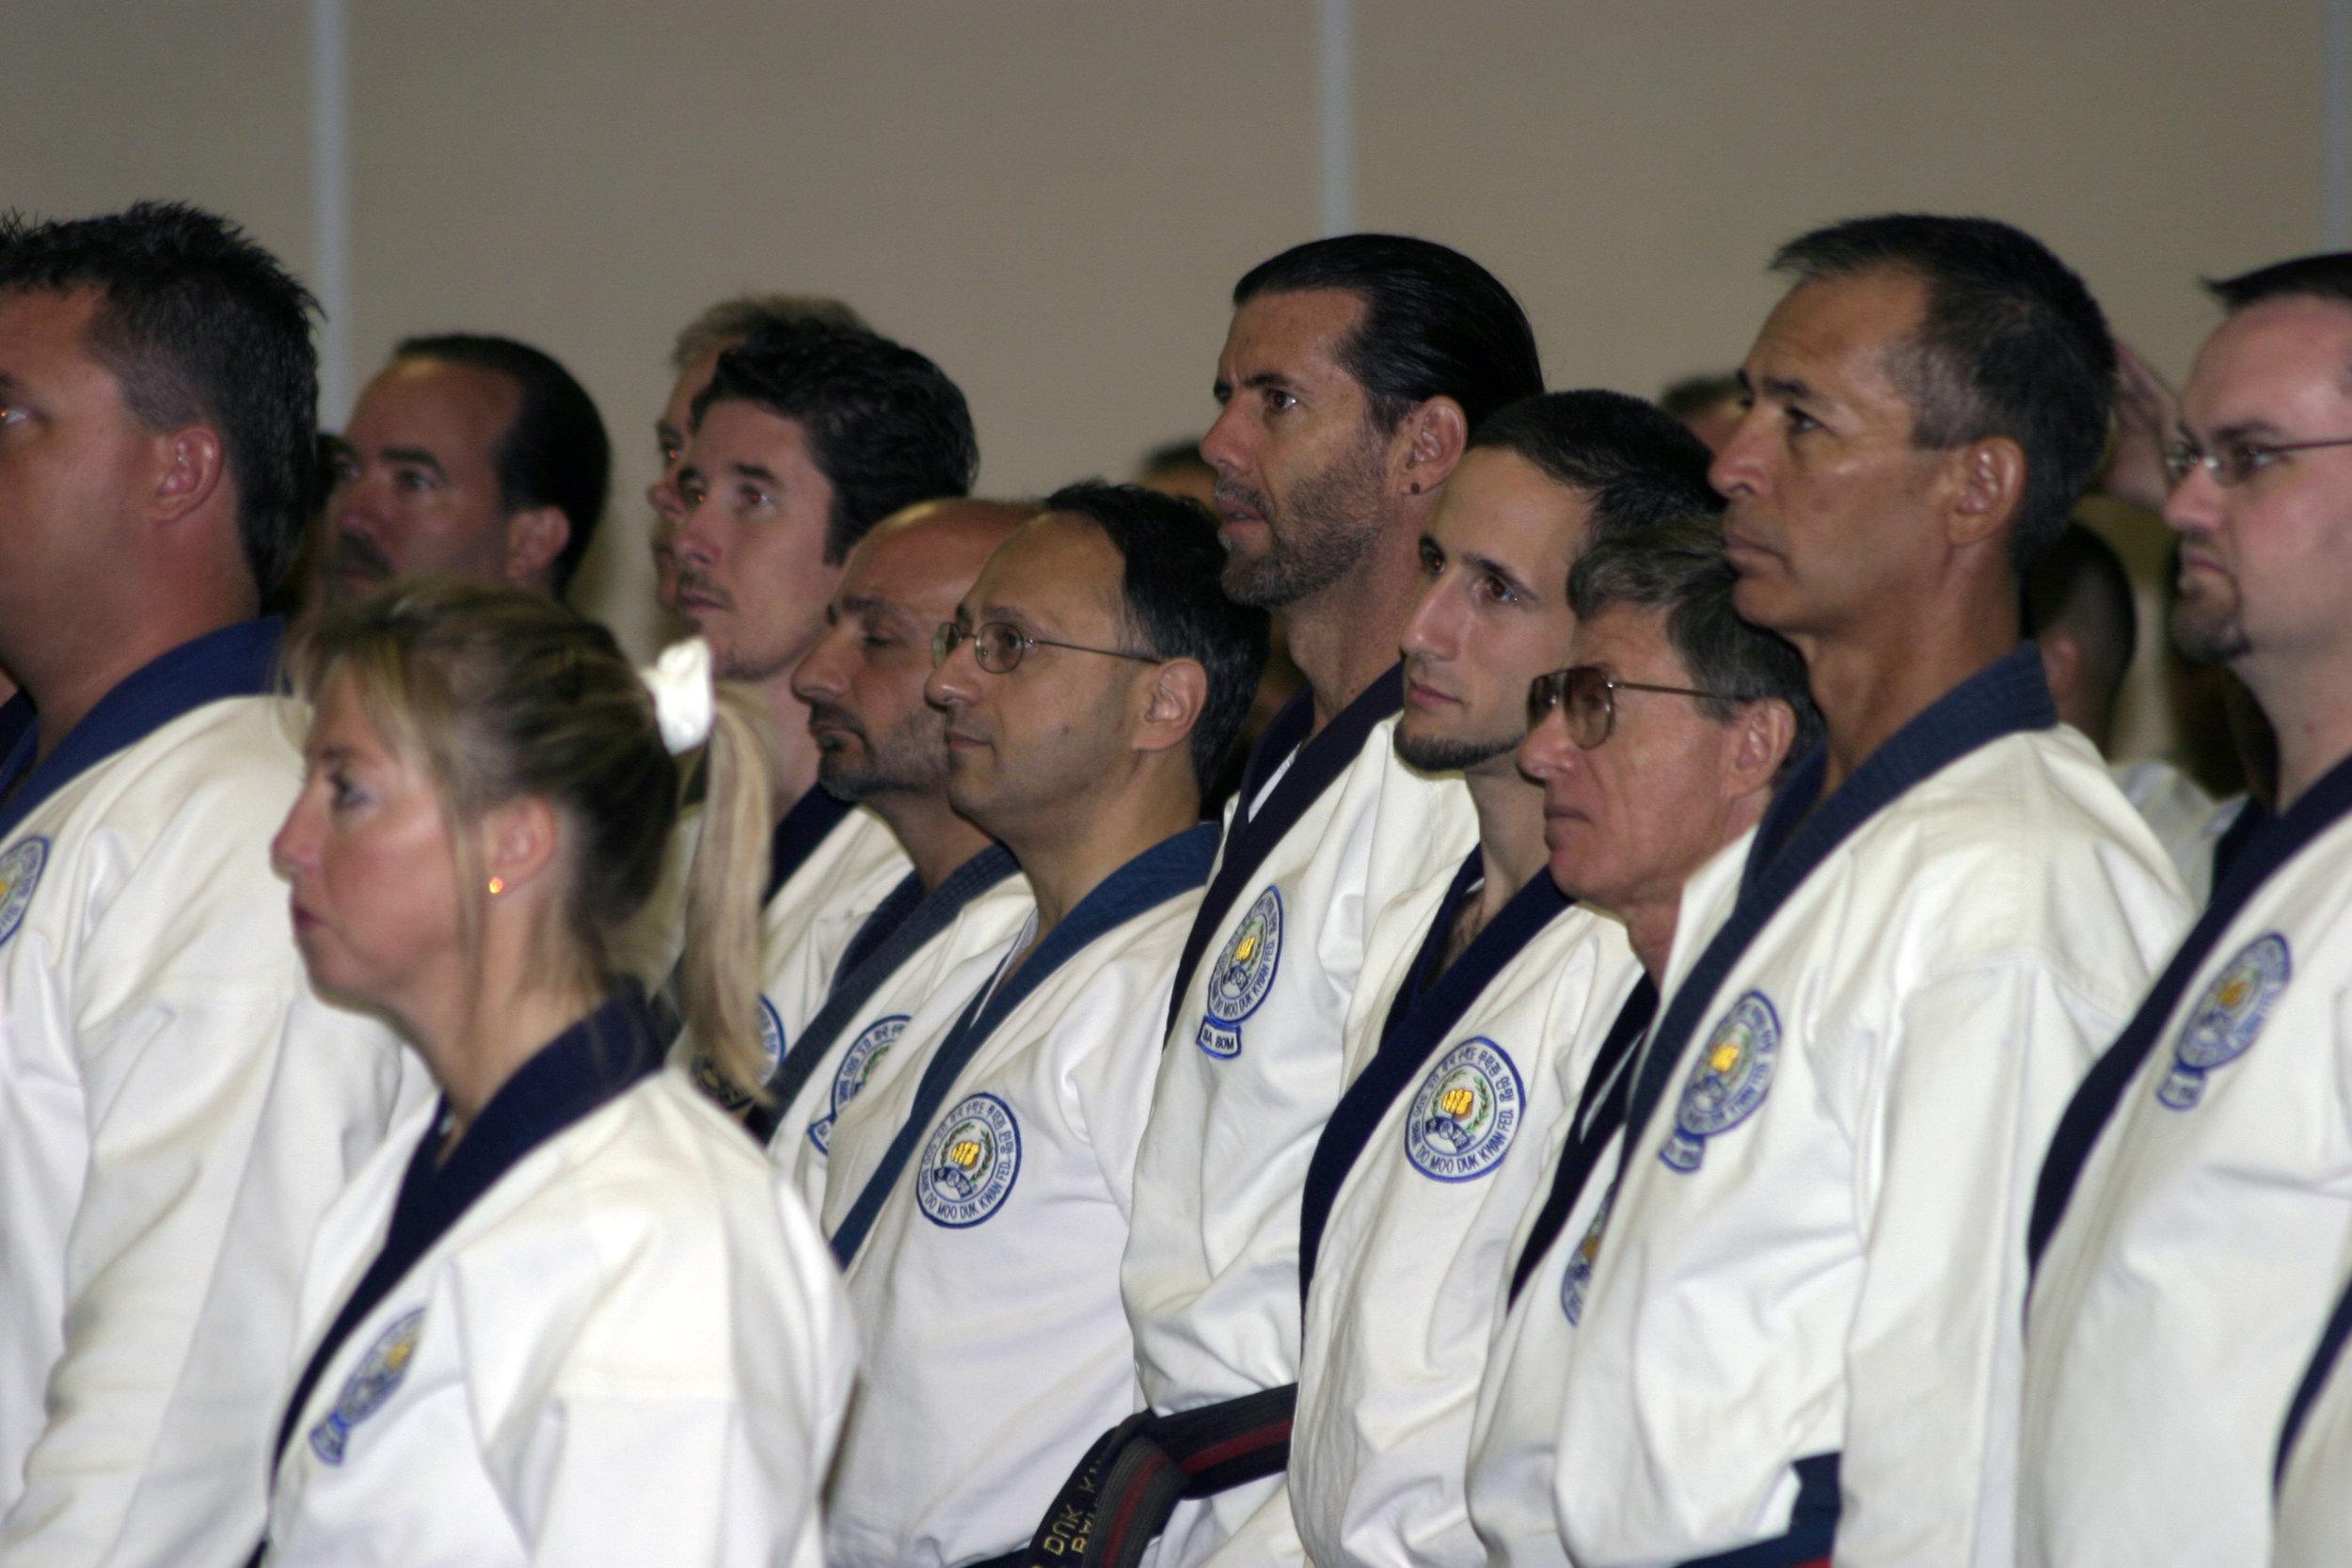 2006_07 Soo Bahk Do National Championship.JPG